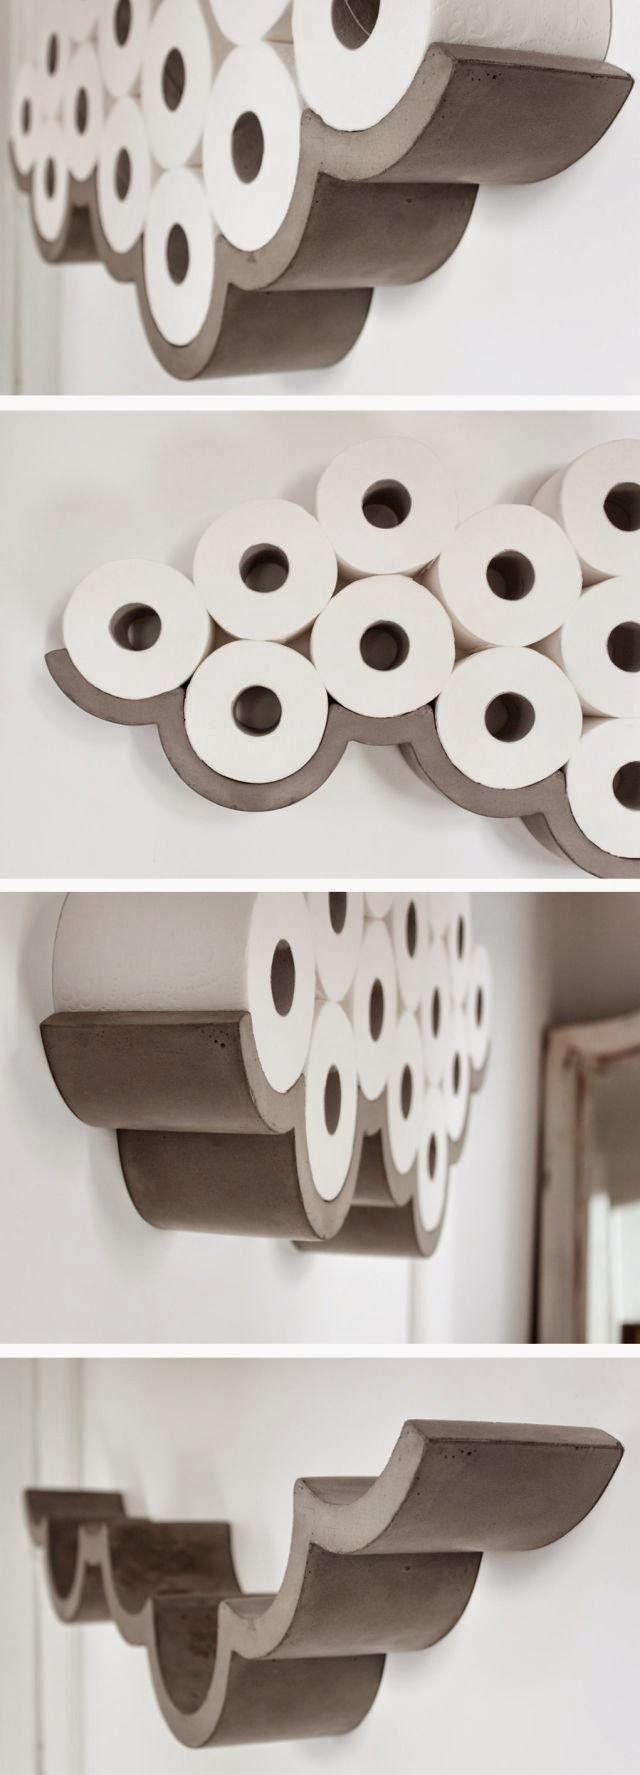 22 Diy Bathroom Decoration Ideas Bathroom Ideas Bathroom Diy